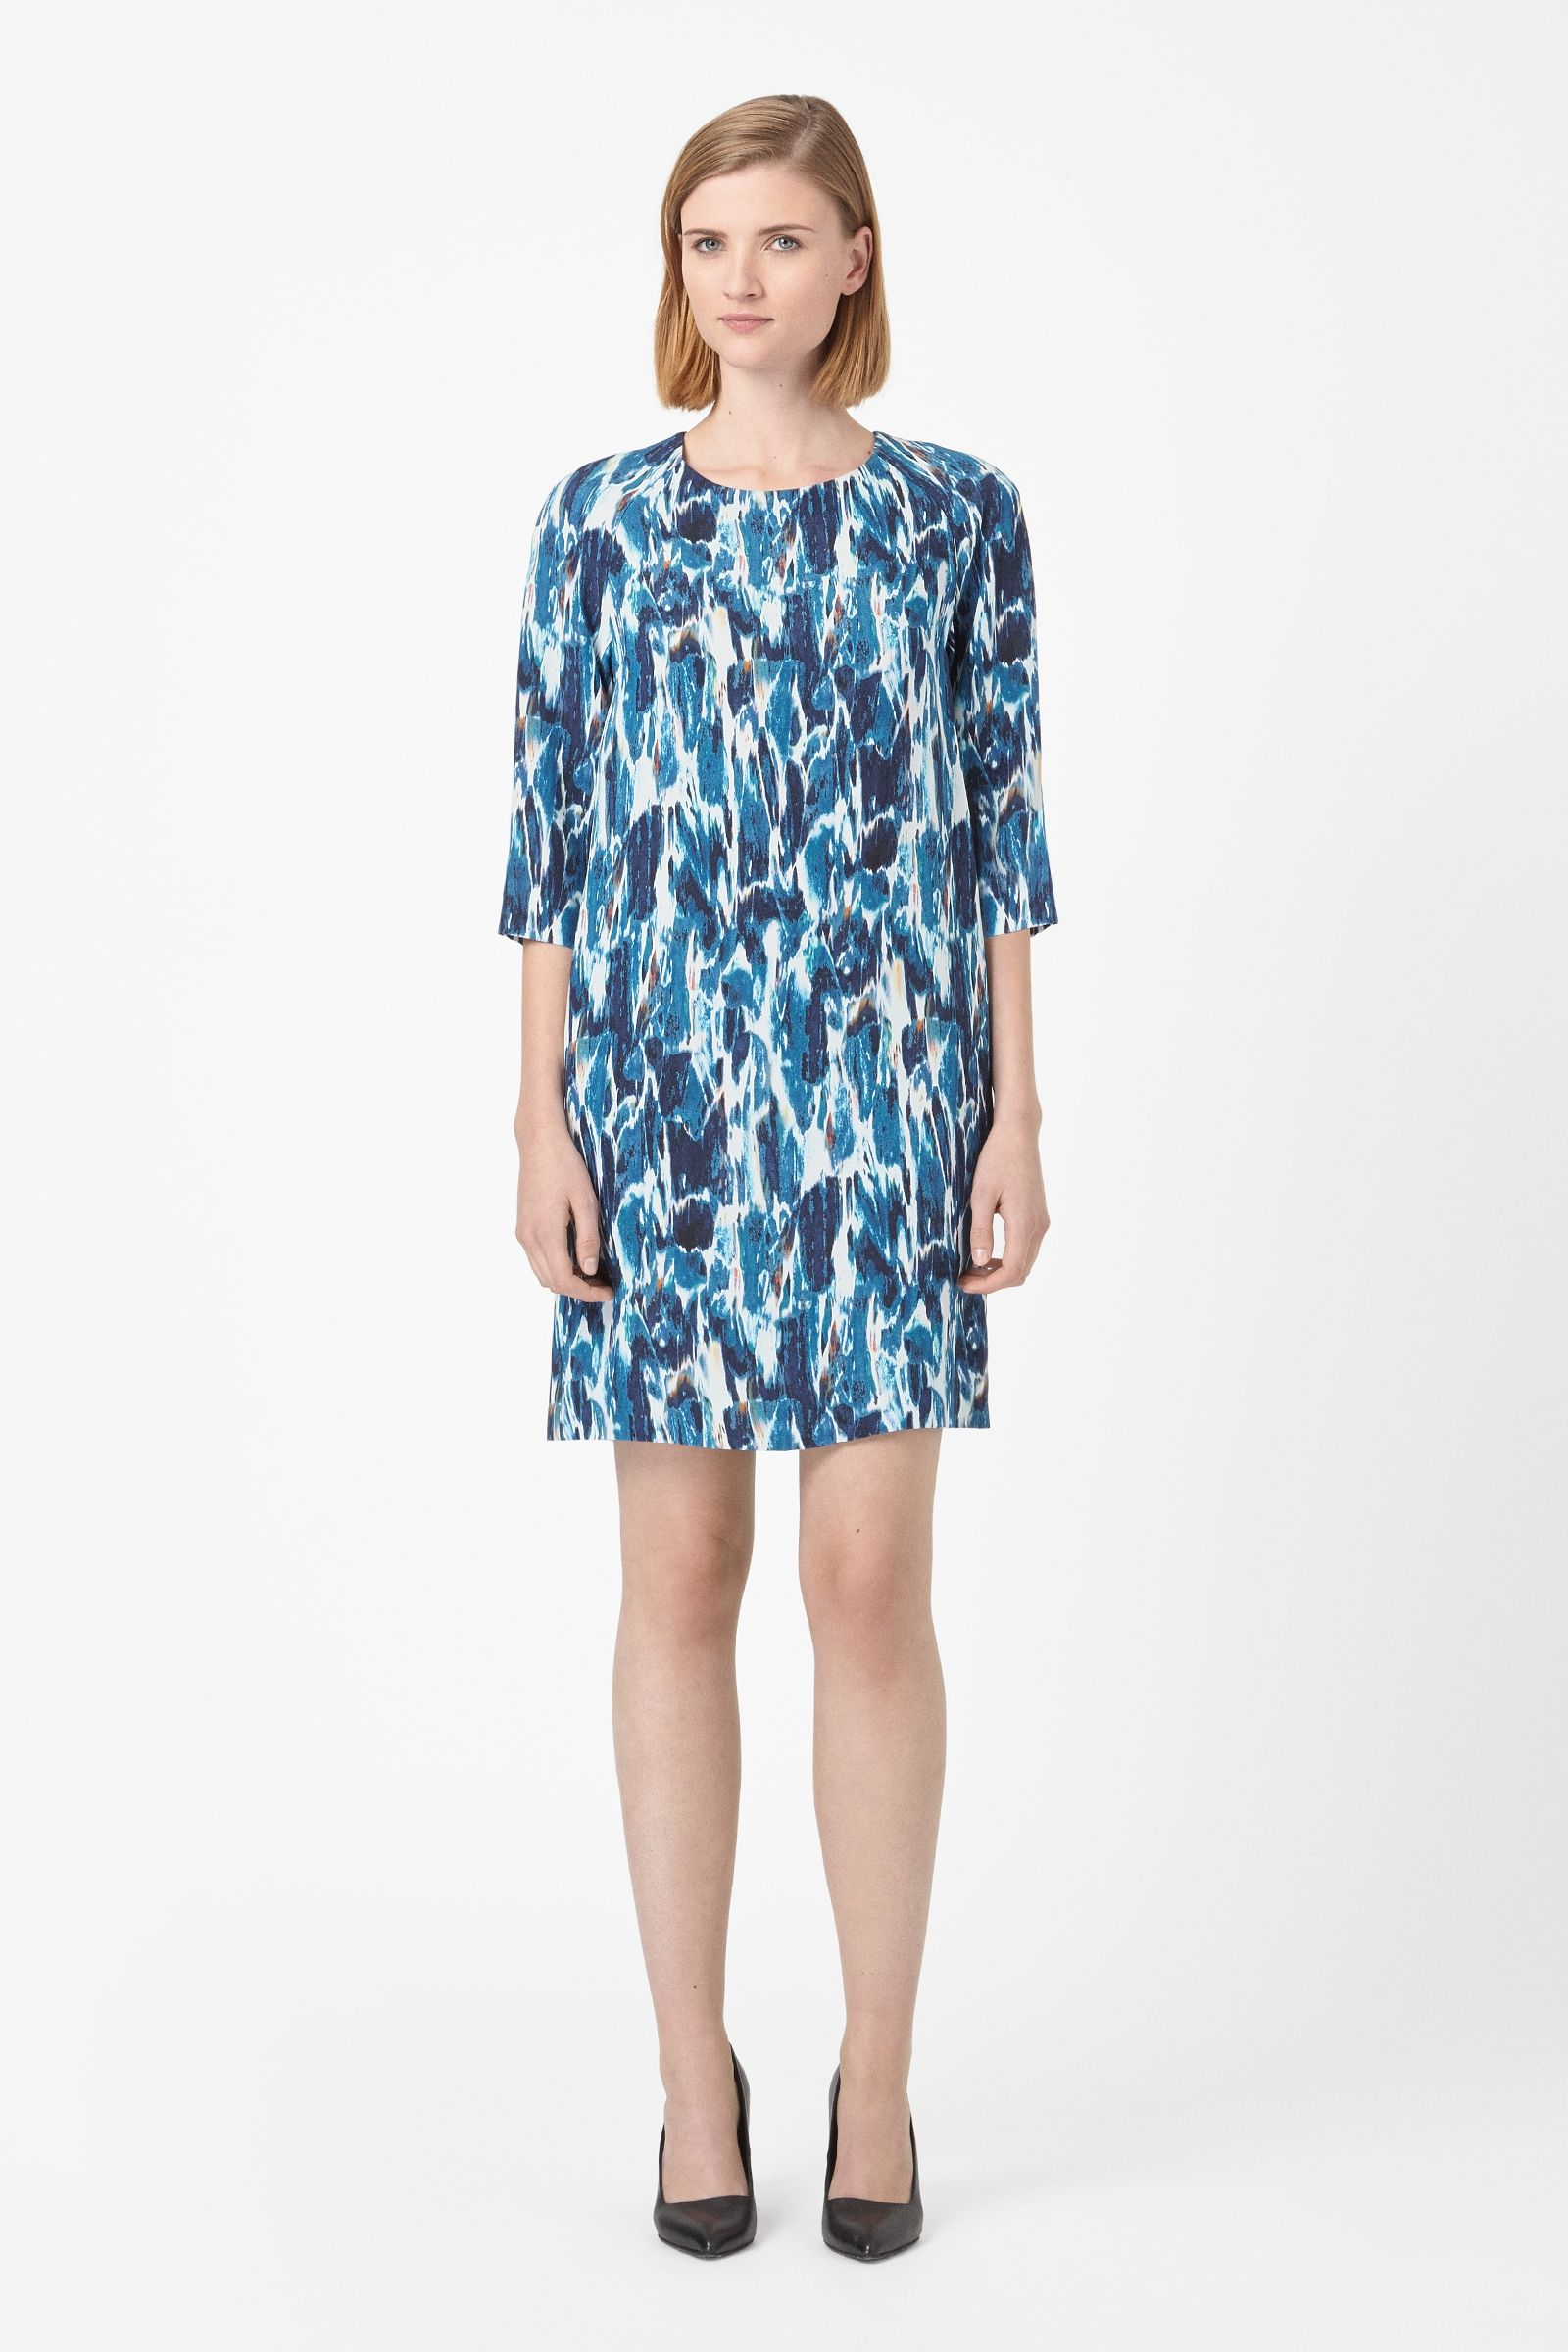 Fluid printed dress | COS wishlist | Pinterest | Woman, Printing and ...